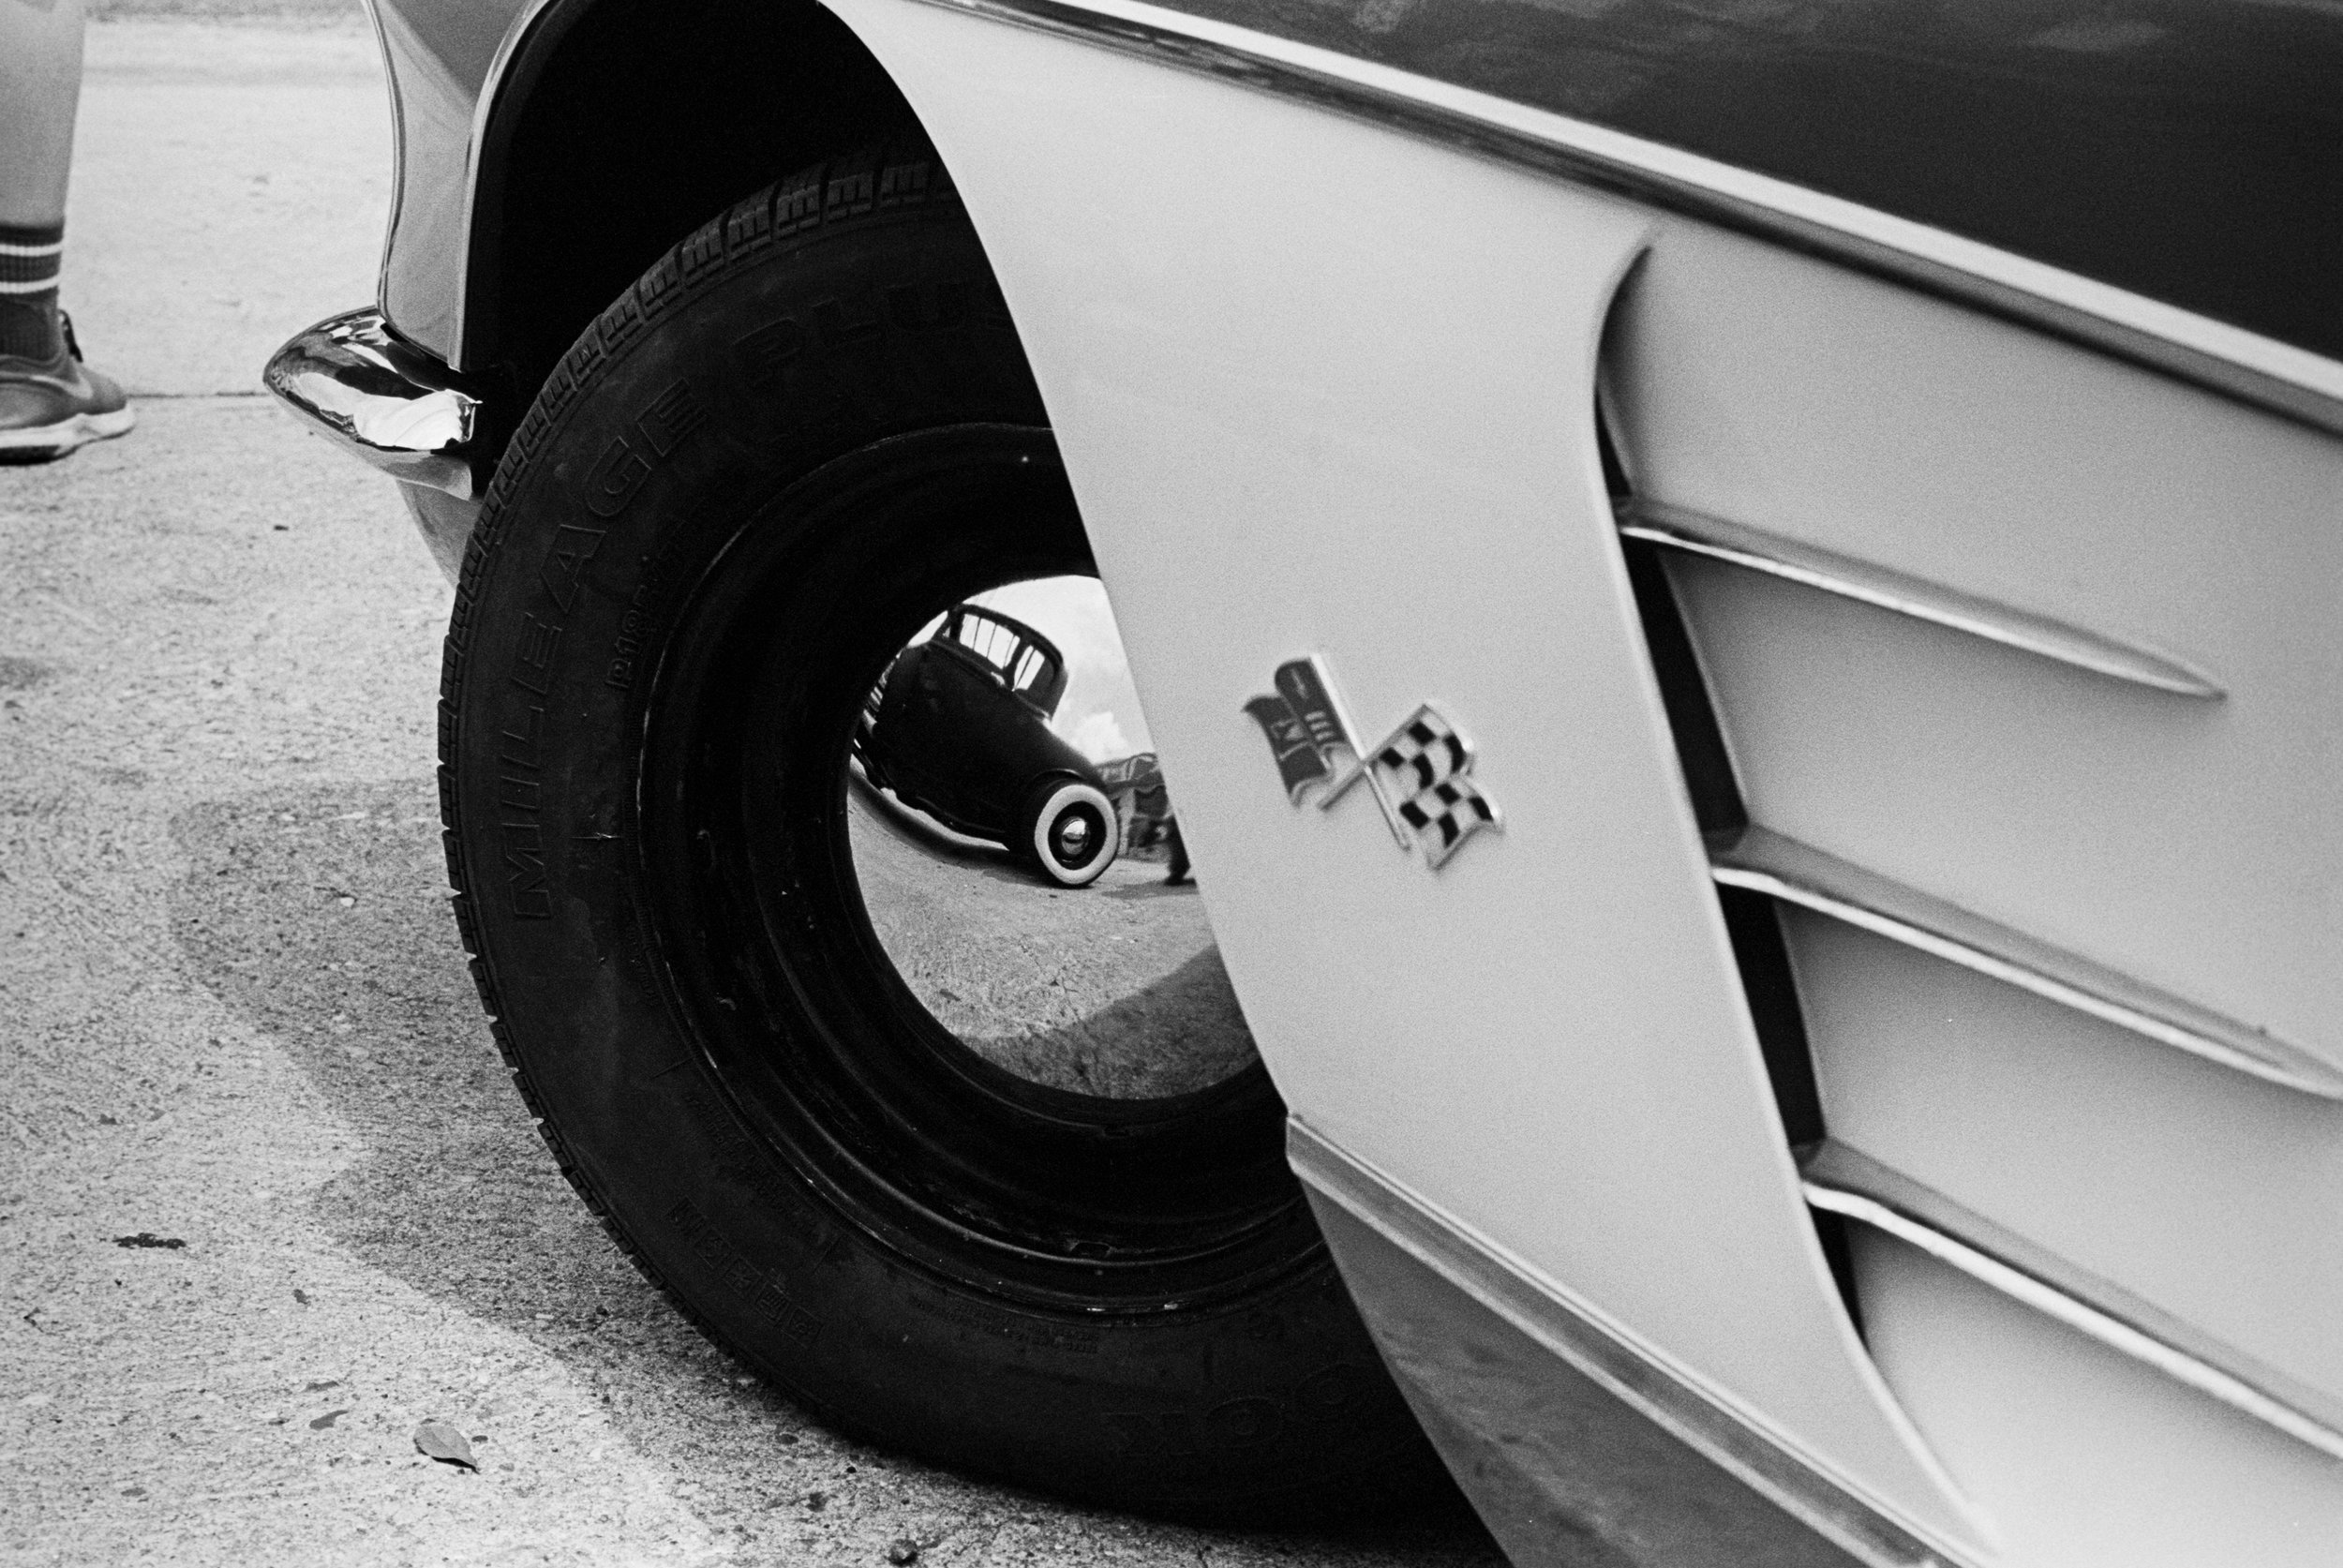 car-show-little-longhorn-saloon-2015-034.jpg